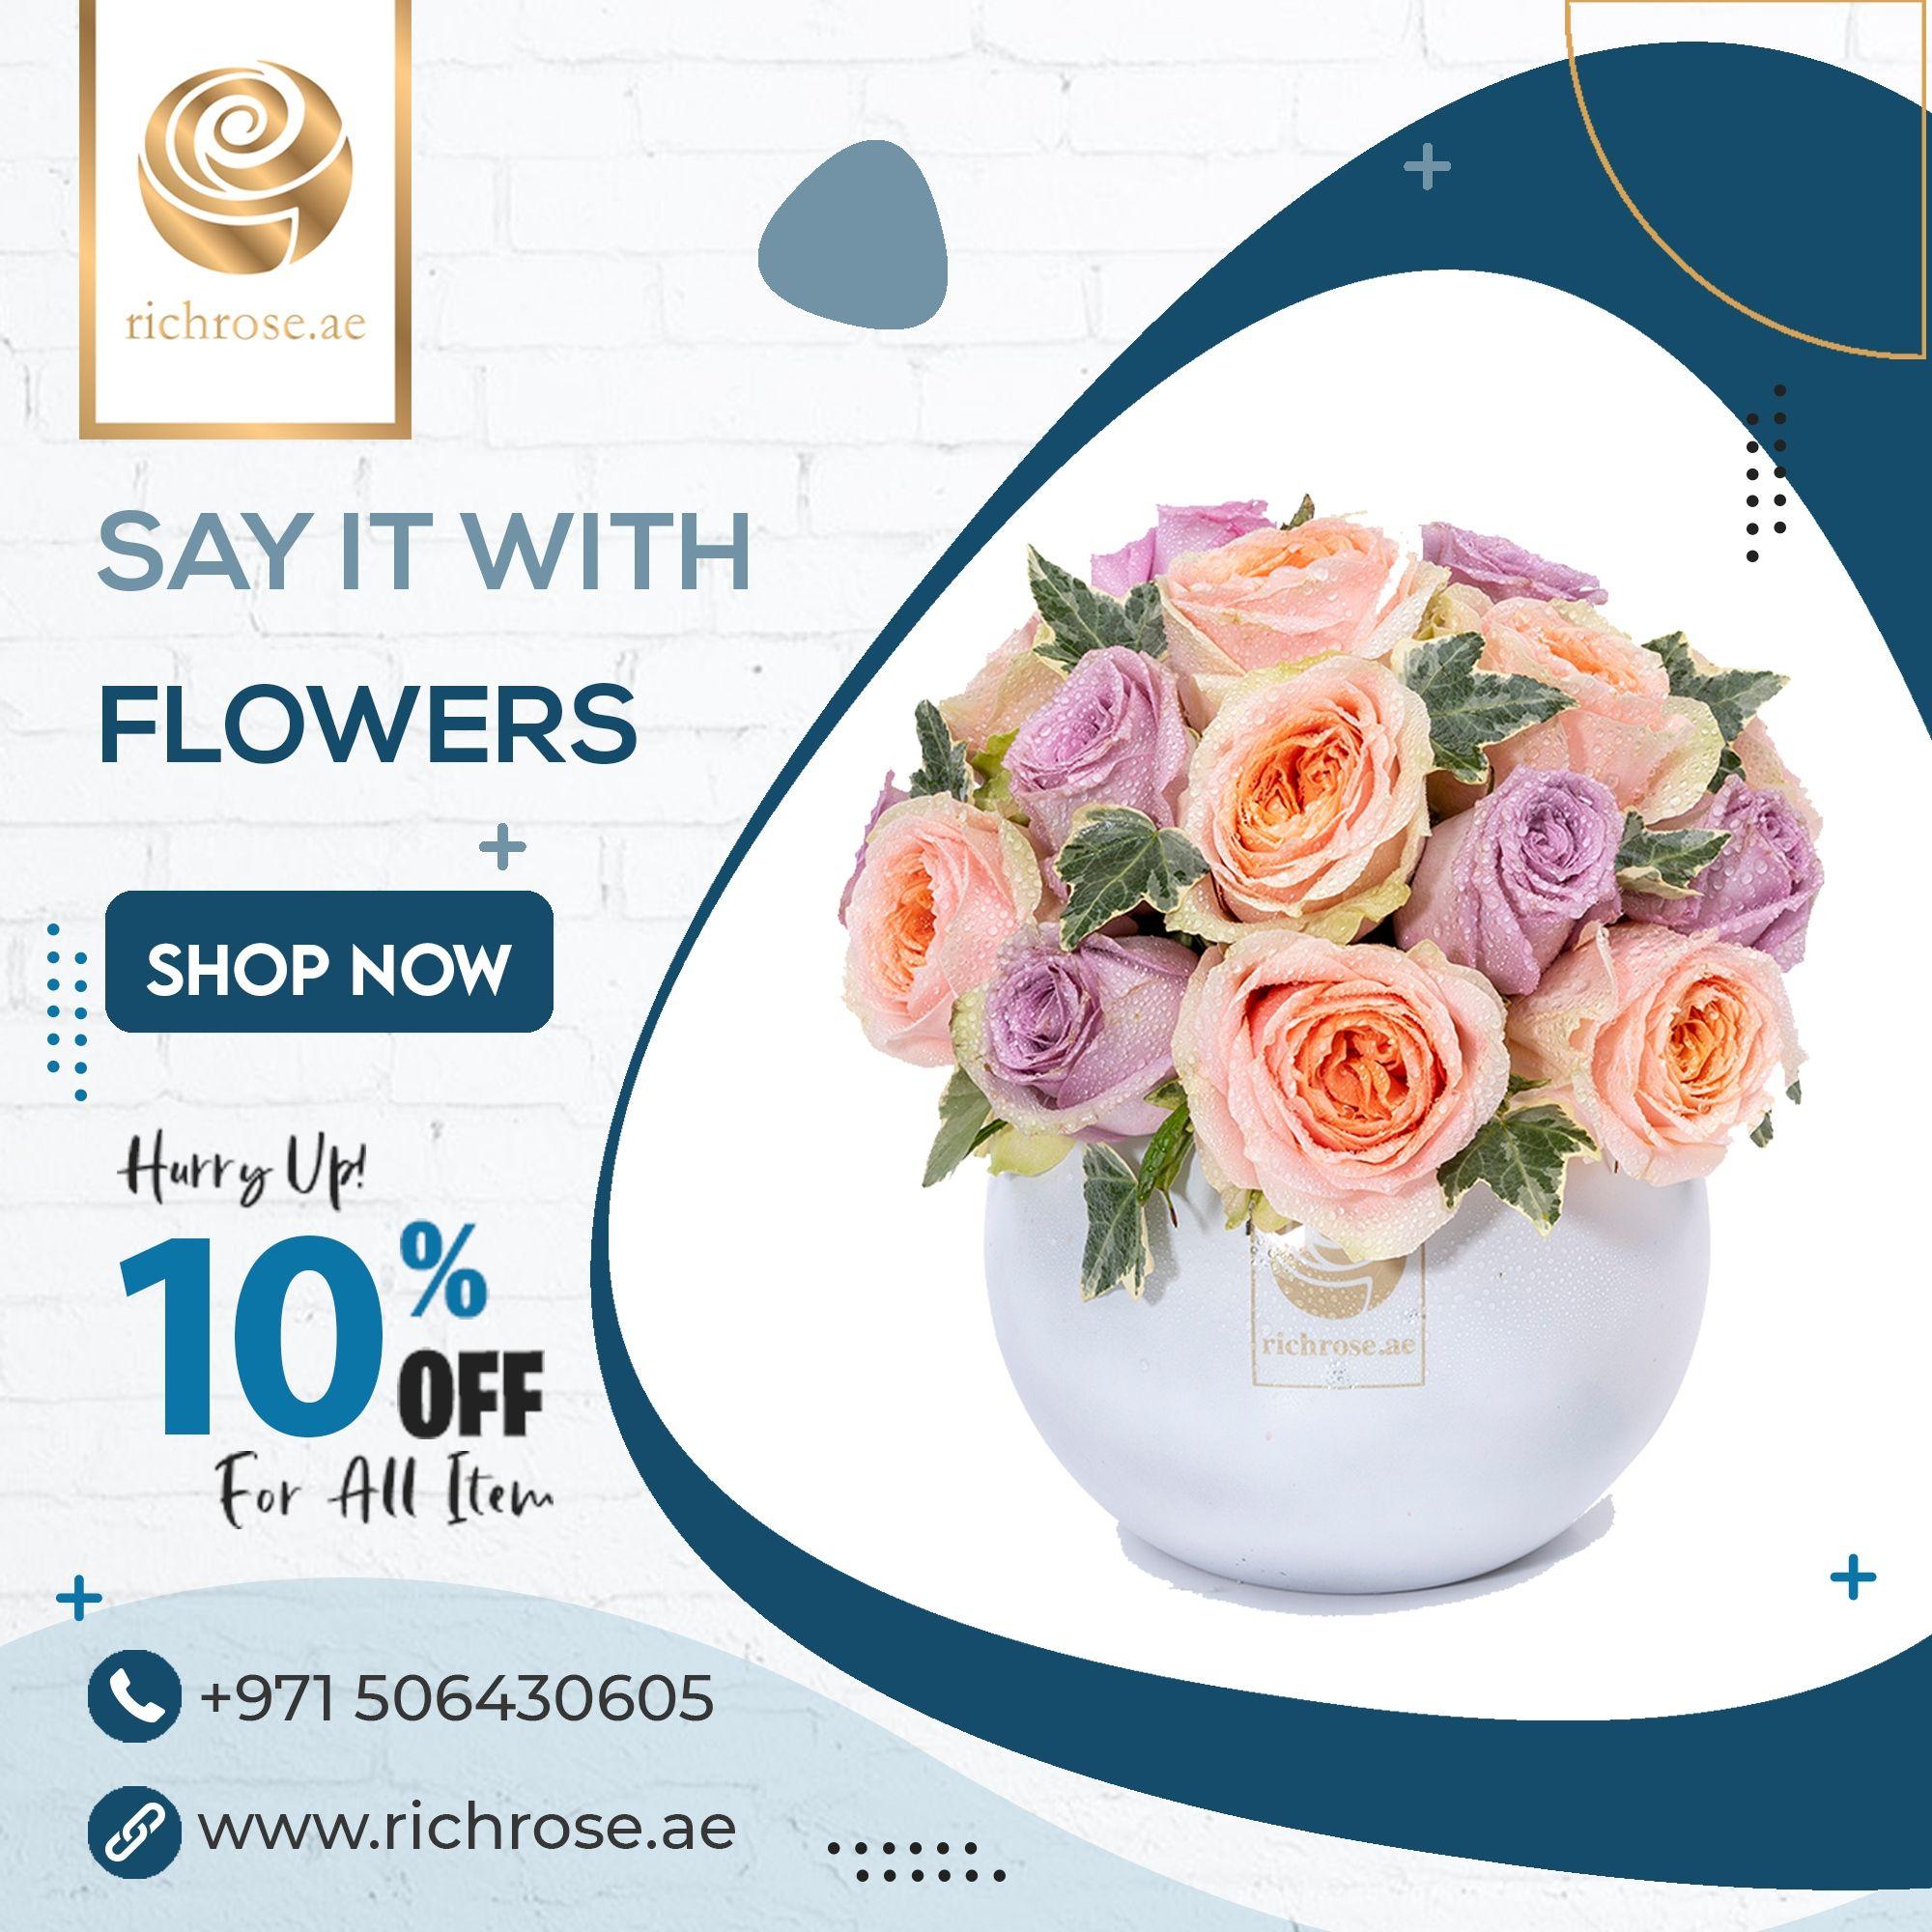 Zagreb Flower Box Online Flower Delivery In Dubai Online Flower Delivery Flower Boxes Purple Roses